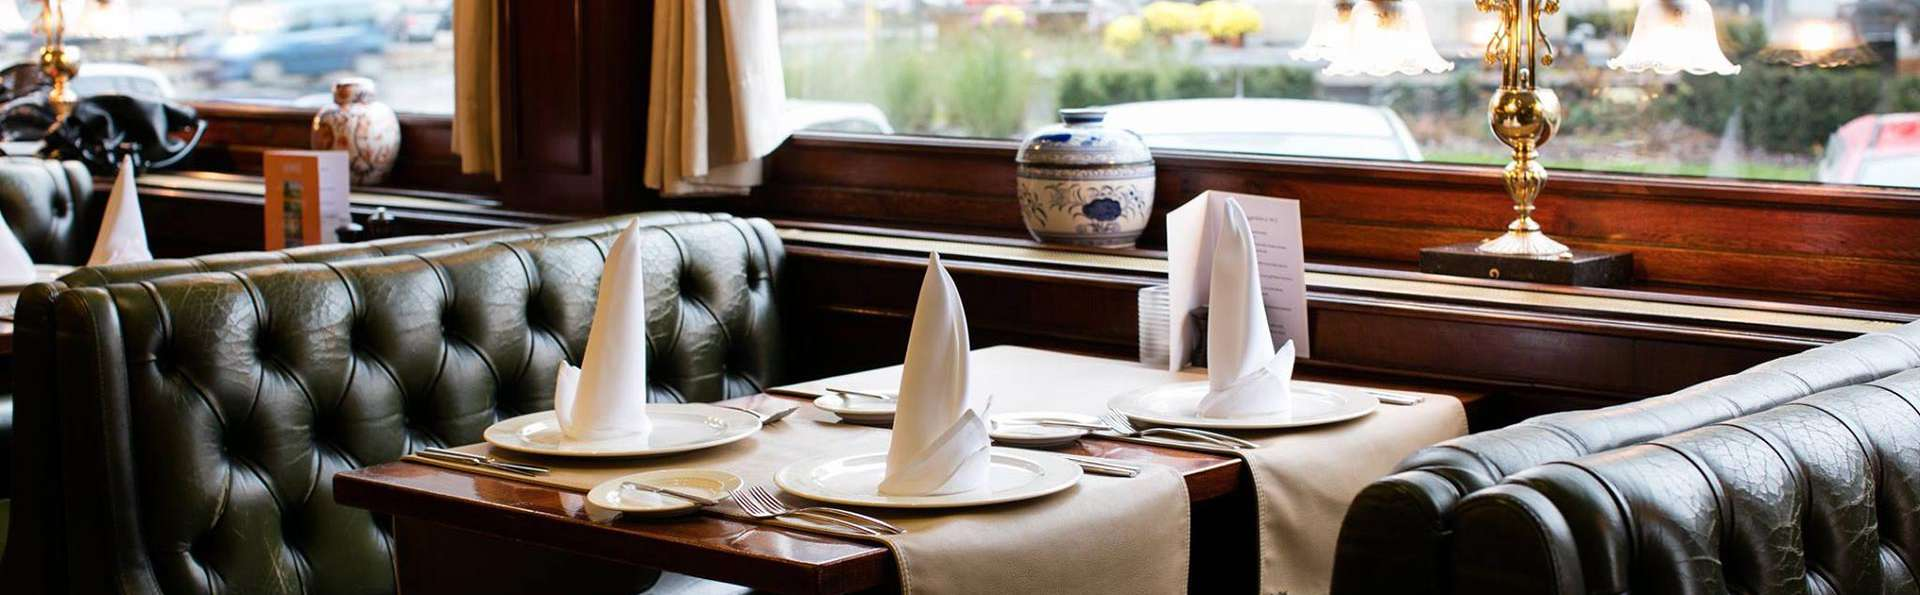 L'Auberge et sa Résidence - EDIT_restaurant2.jpg